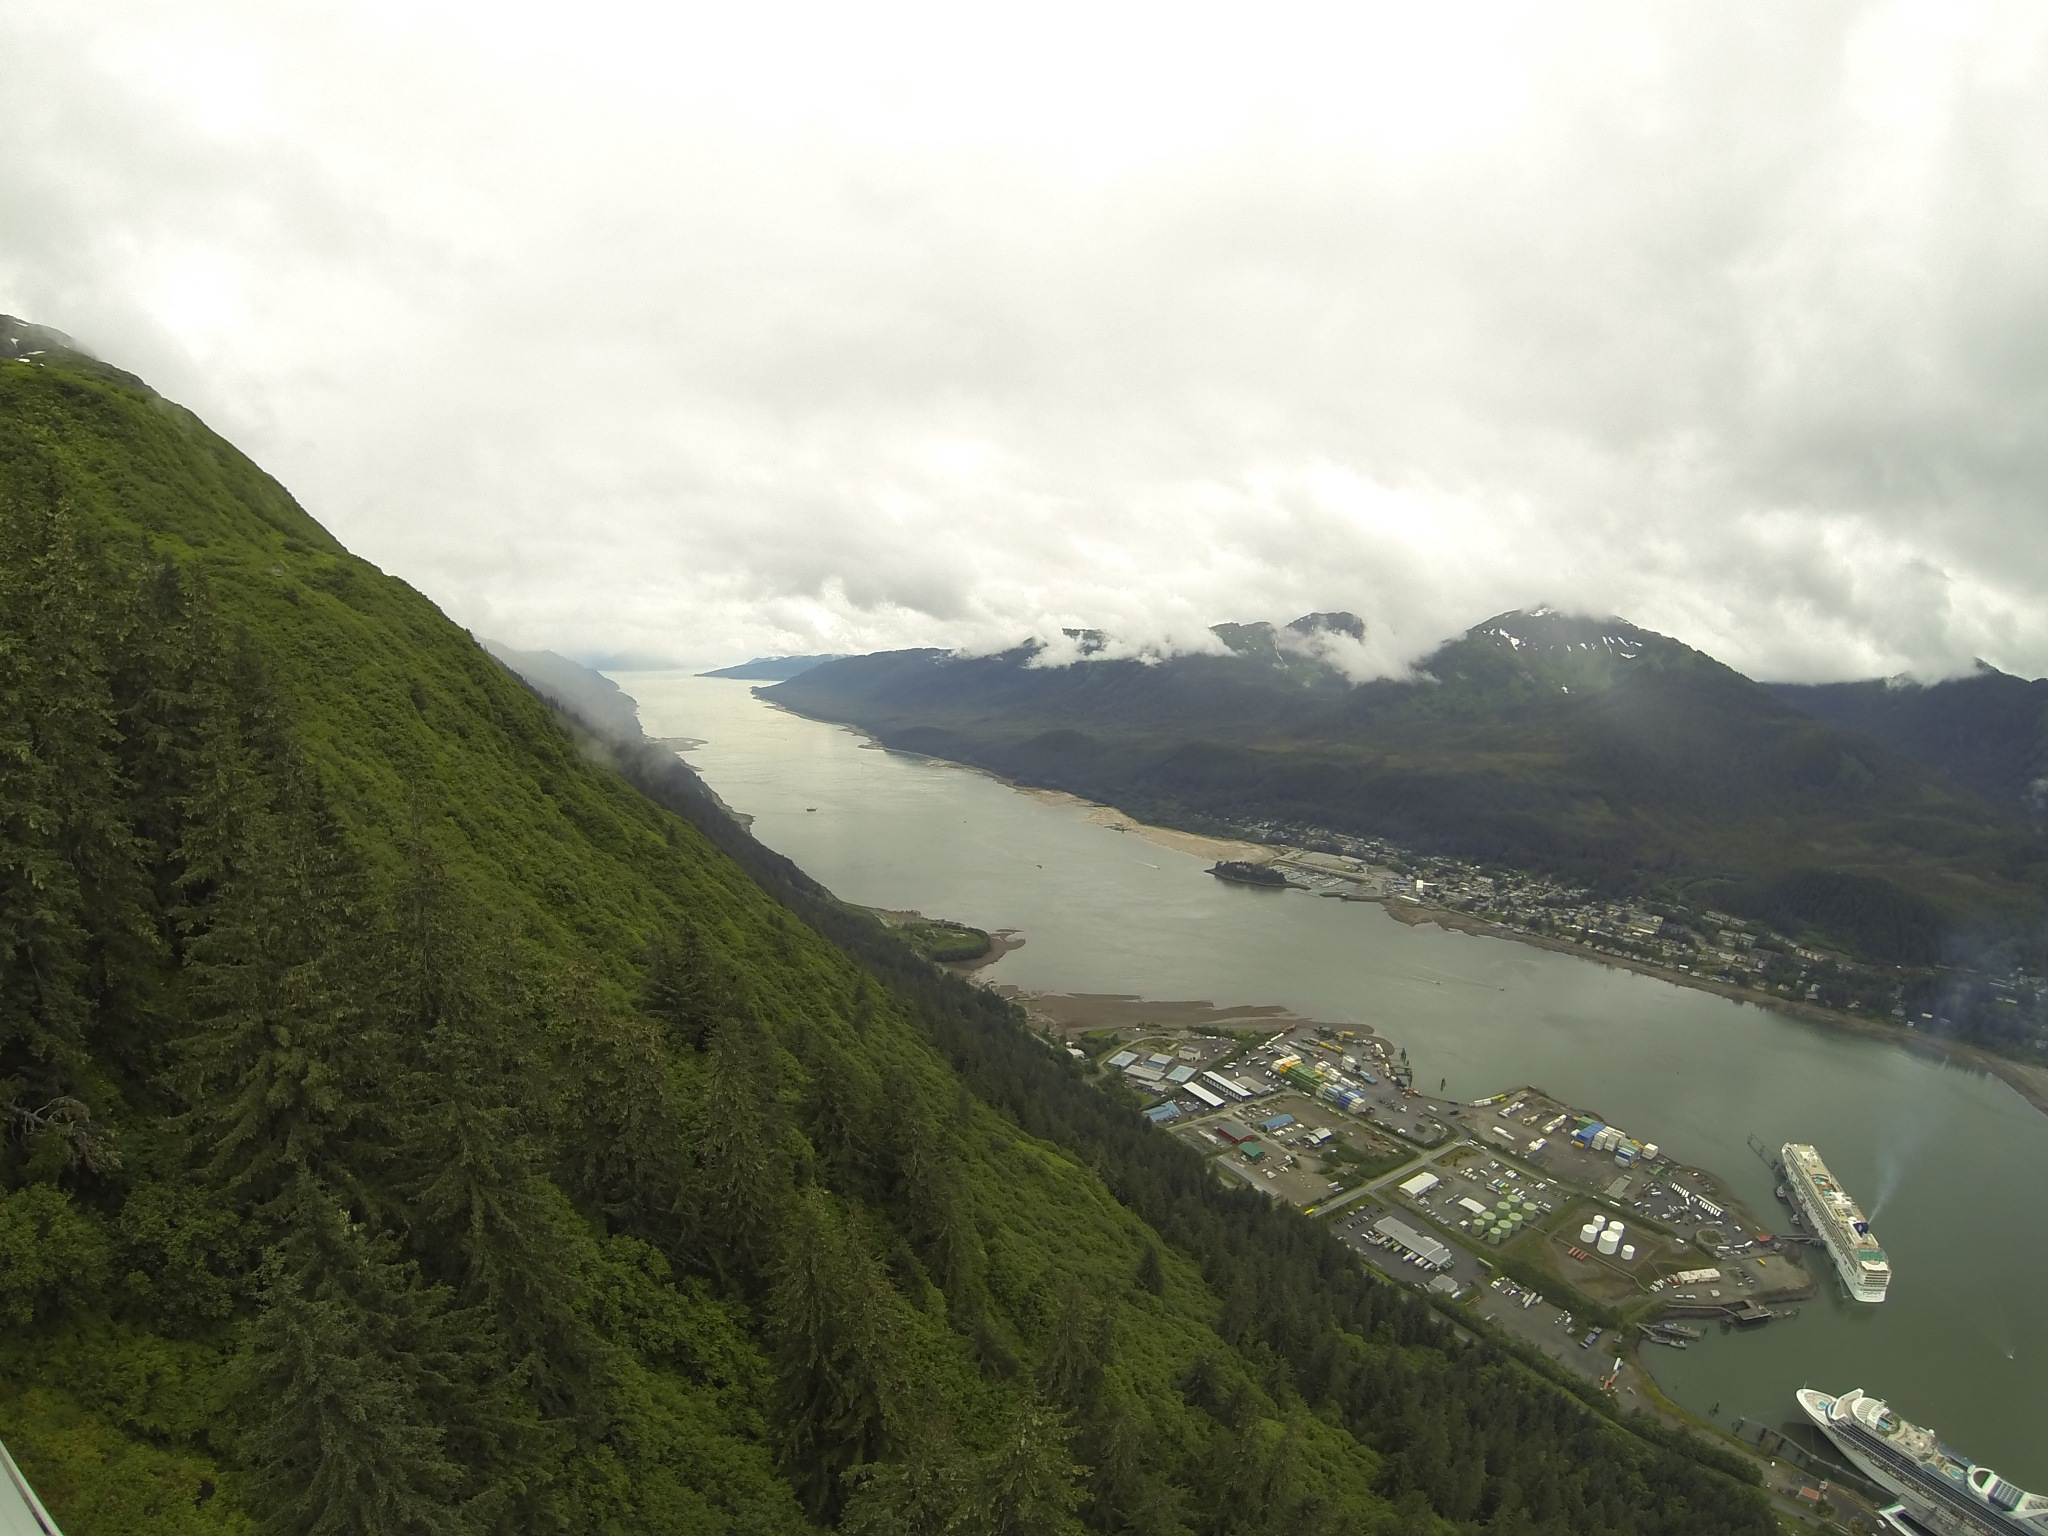 Juneau, Alaska by mrusc96